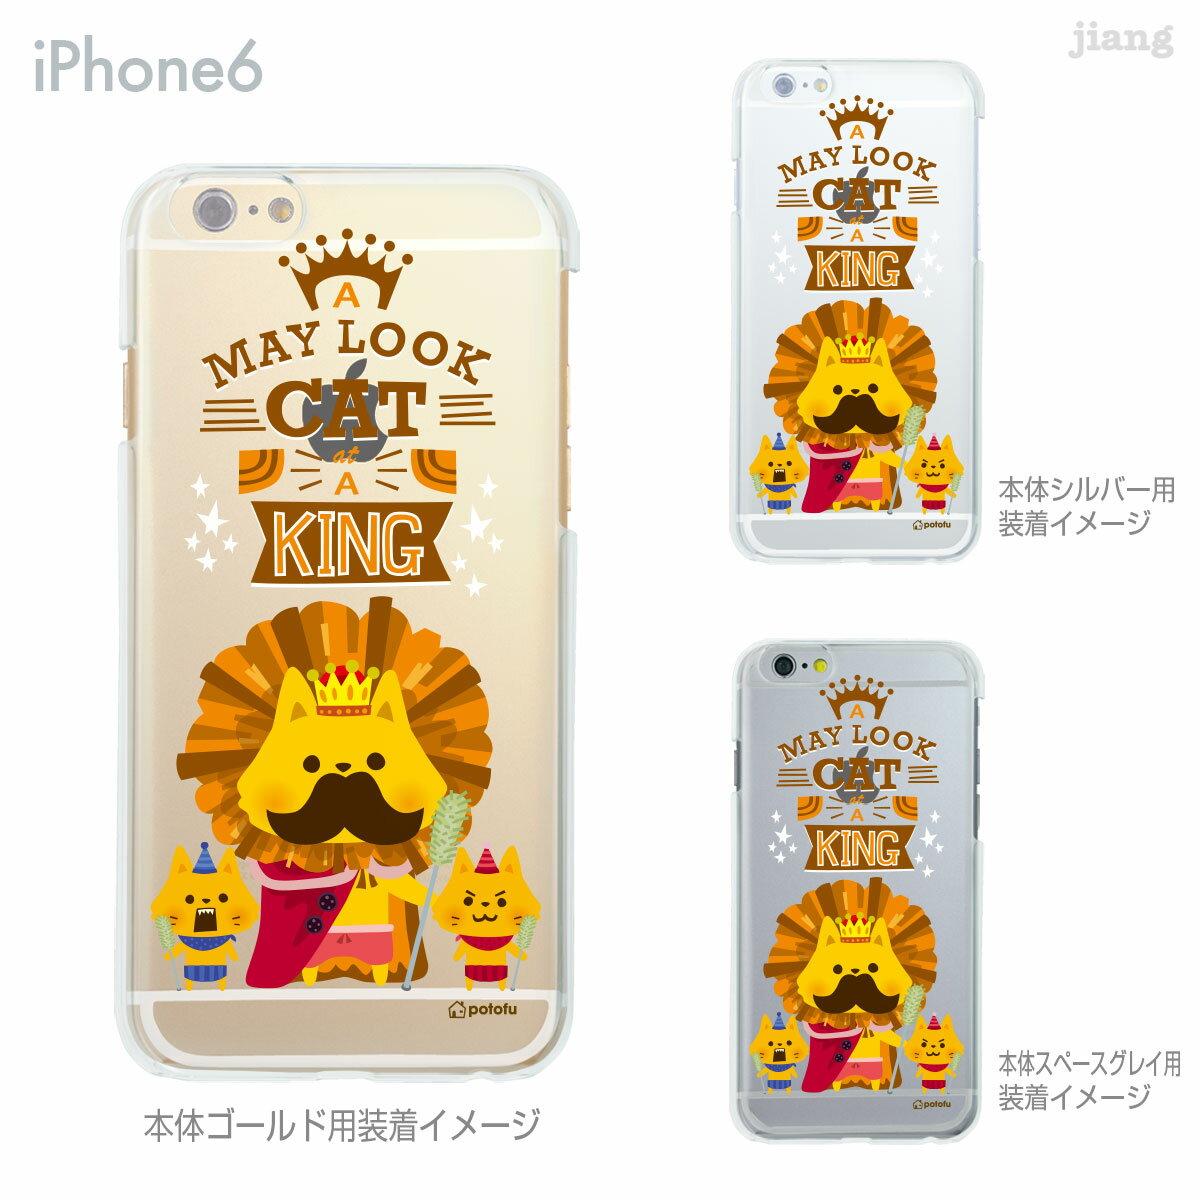 iPhone8ケース iphone8 ケース iPhone7ケース iPhone7 ケースiphone クリアケース クリア ソフトケース iphone8 iphone7s Plus iPhone6s iPhone6 Plus アイフォン8 スマホケース カバー TPU かわいい potofu 80-ip6-tp0018